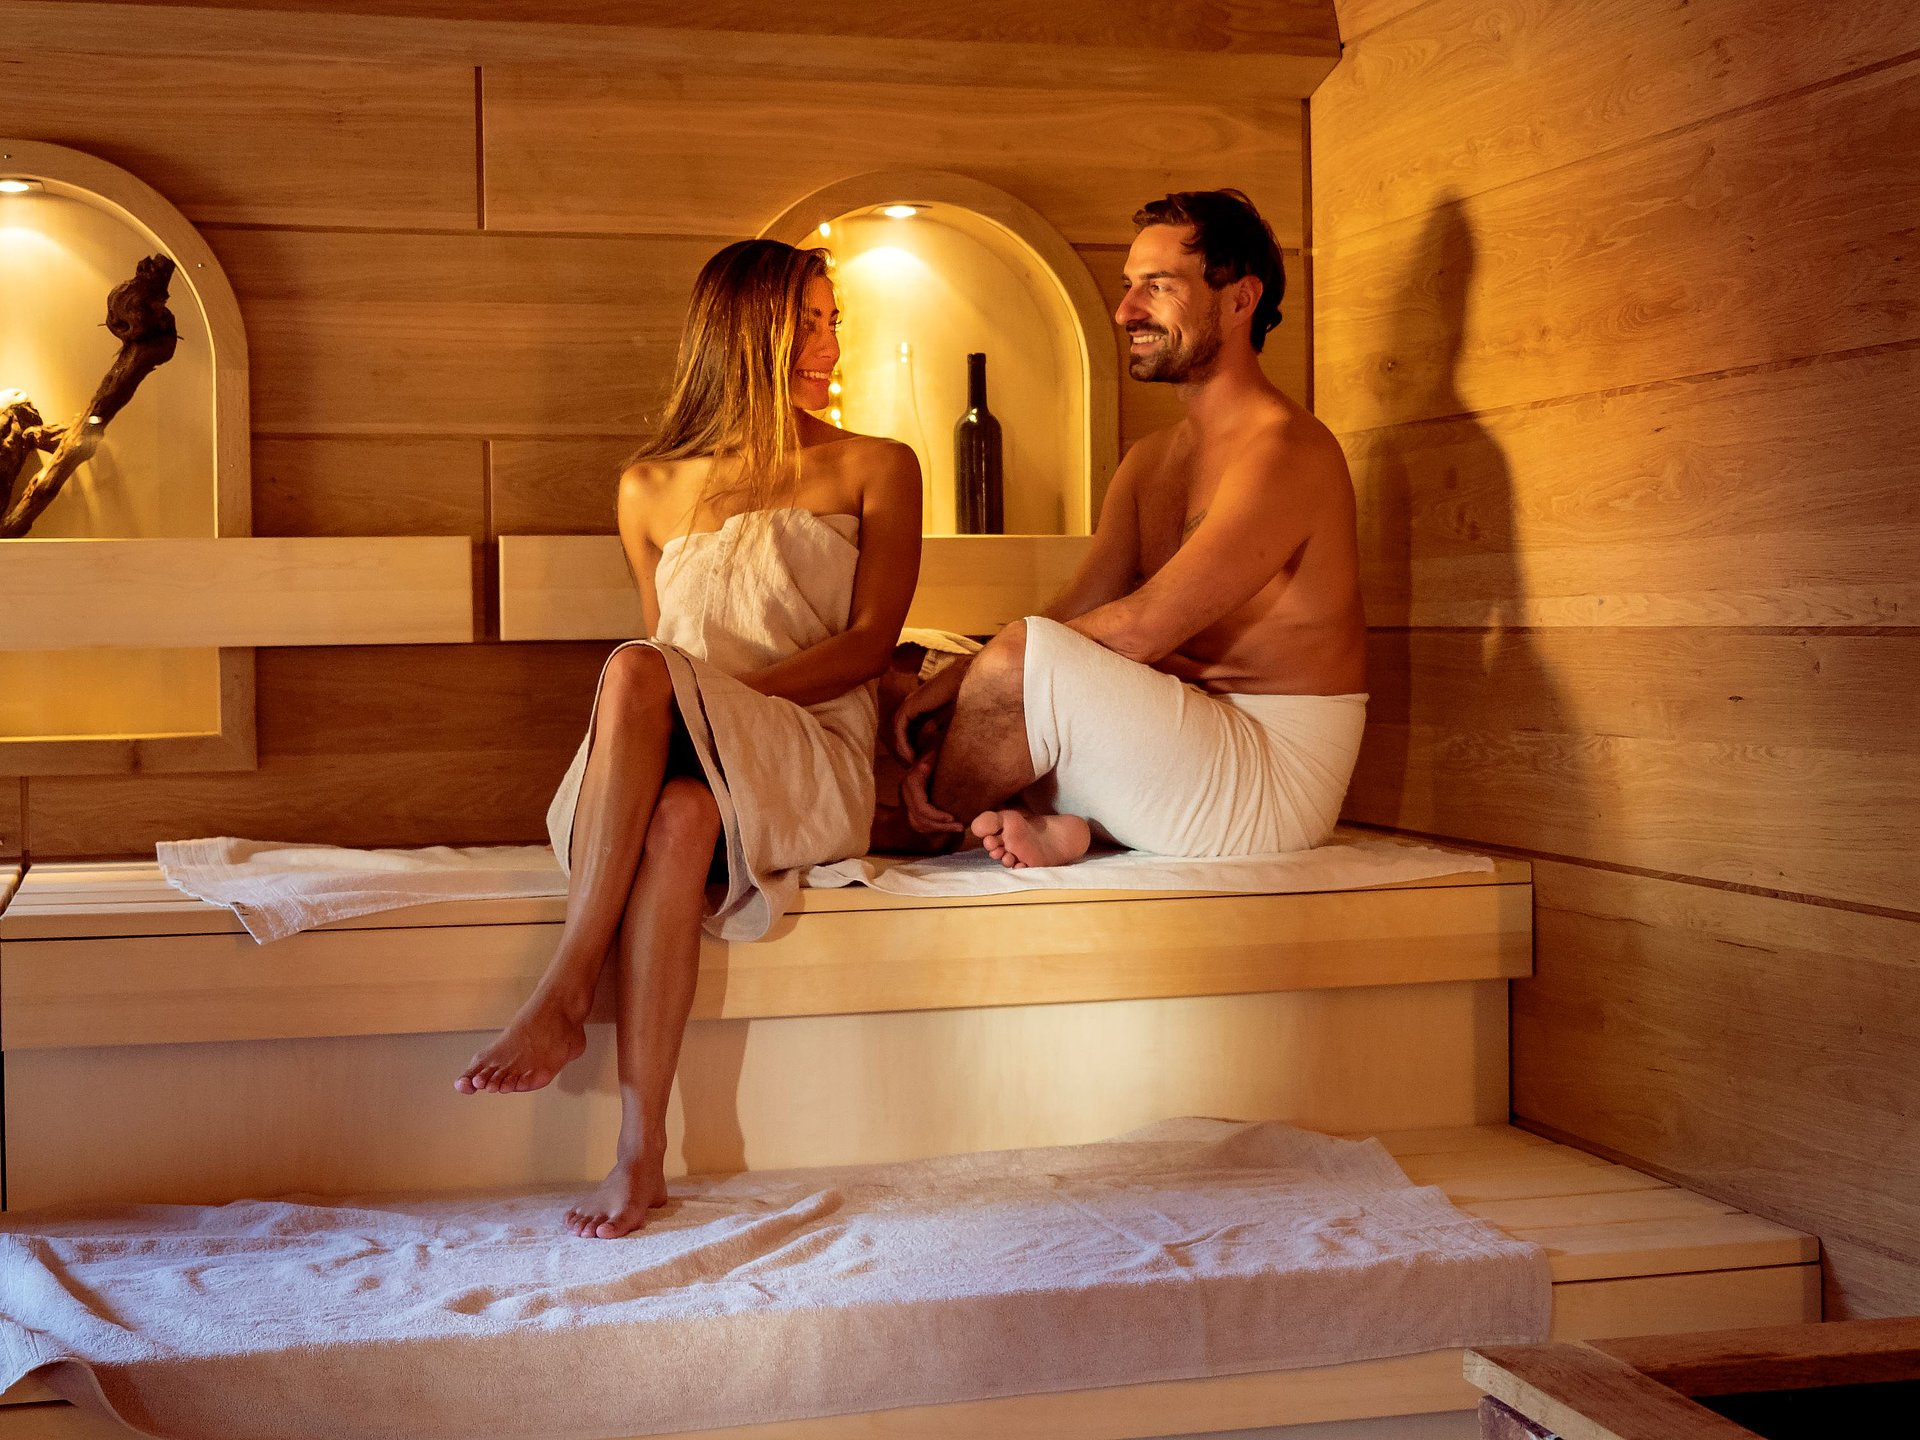 Ontspanning in de Riesling-sauna in de Südpfalz Therme, Palts